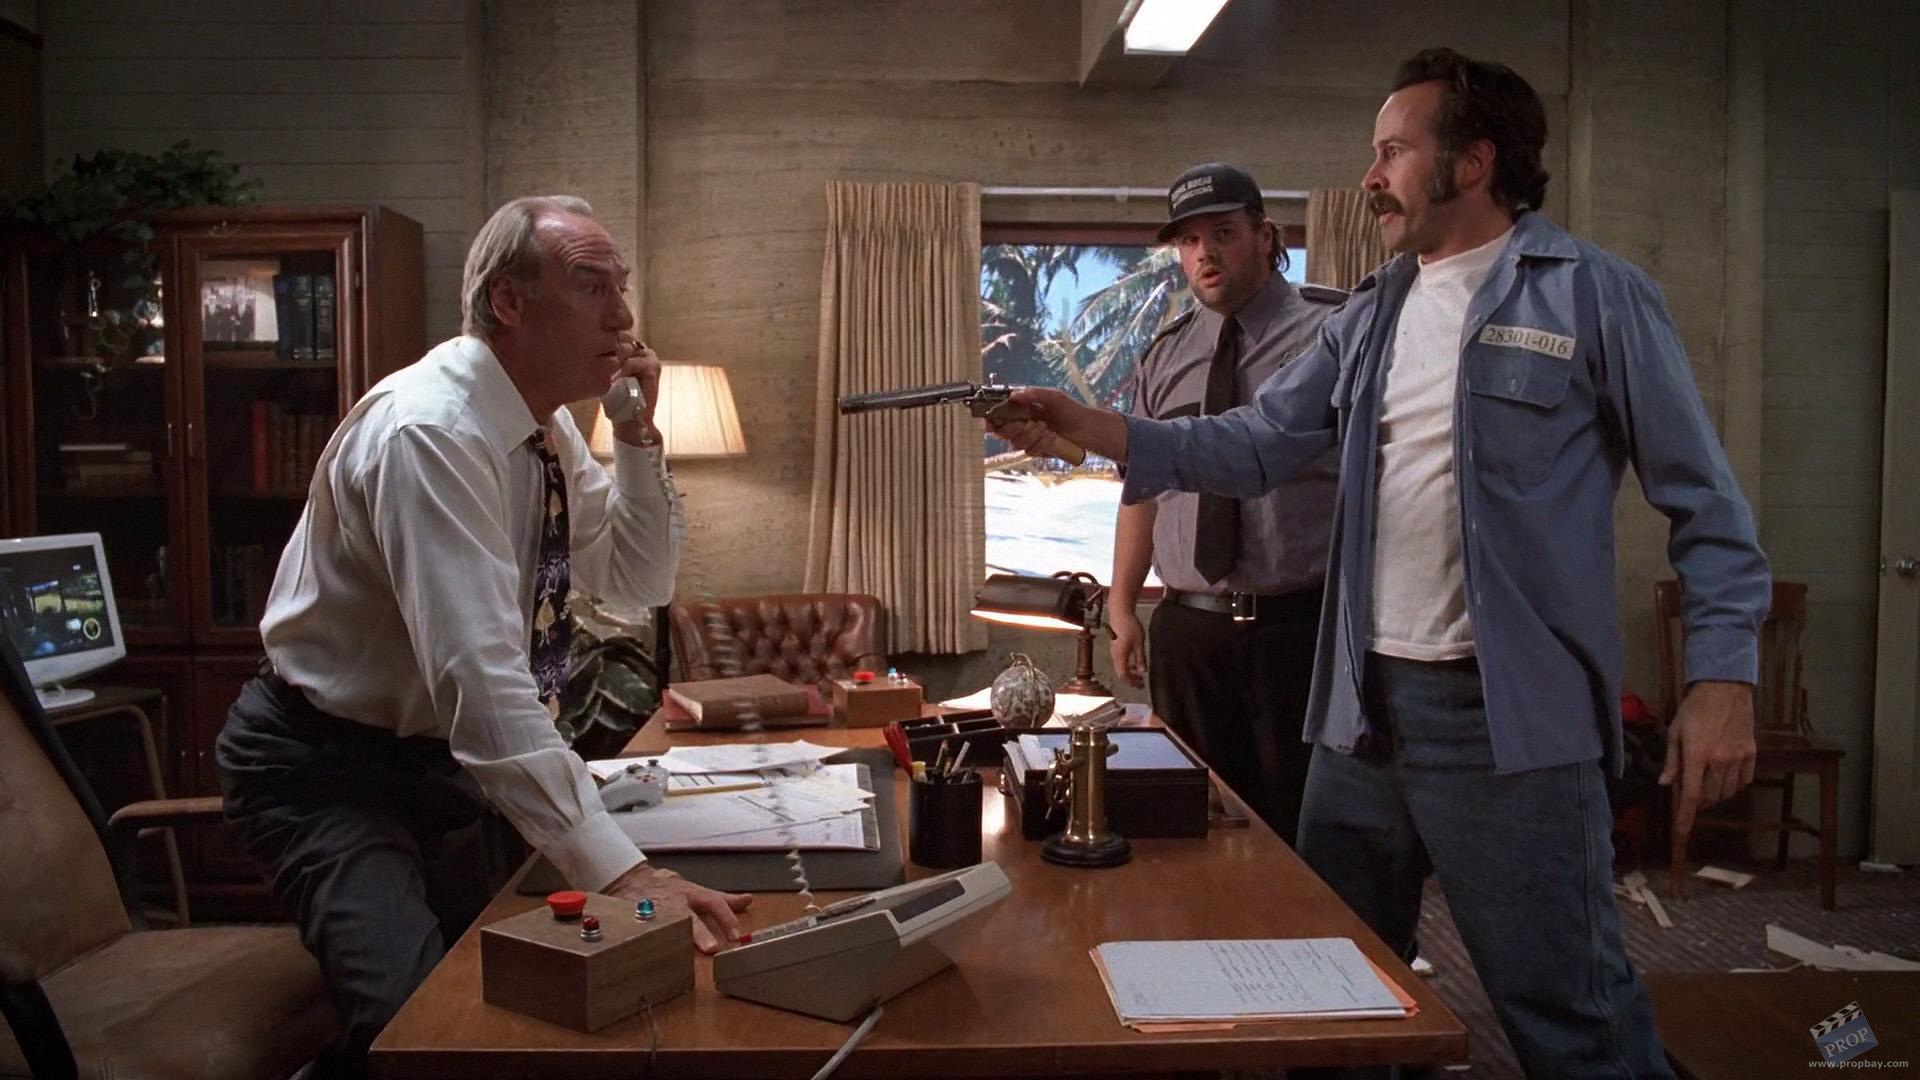 Hero Prison Zip Gun Movie Prop From My Name Is Earl Tv